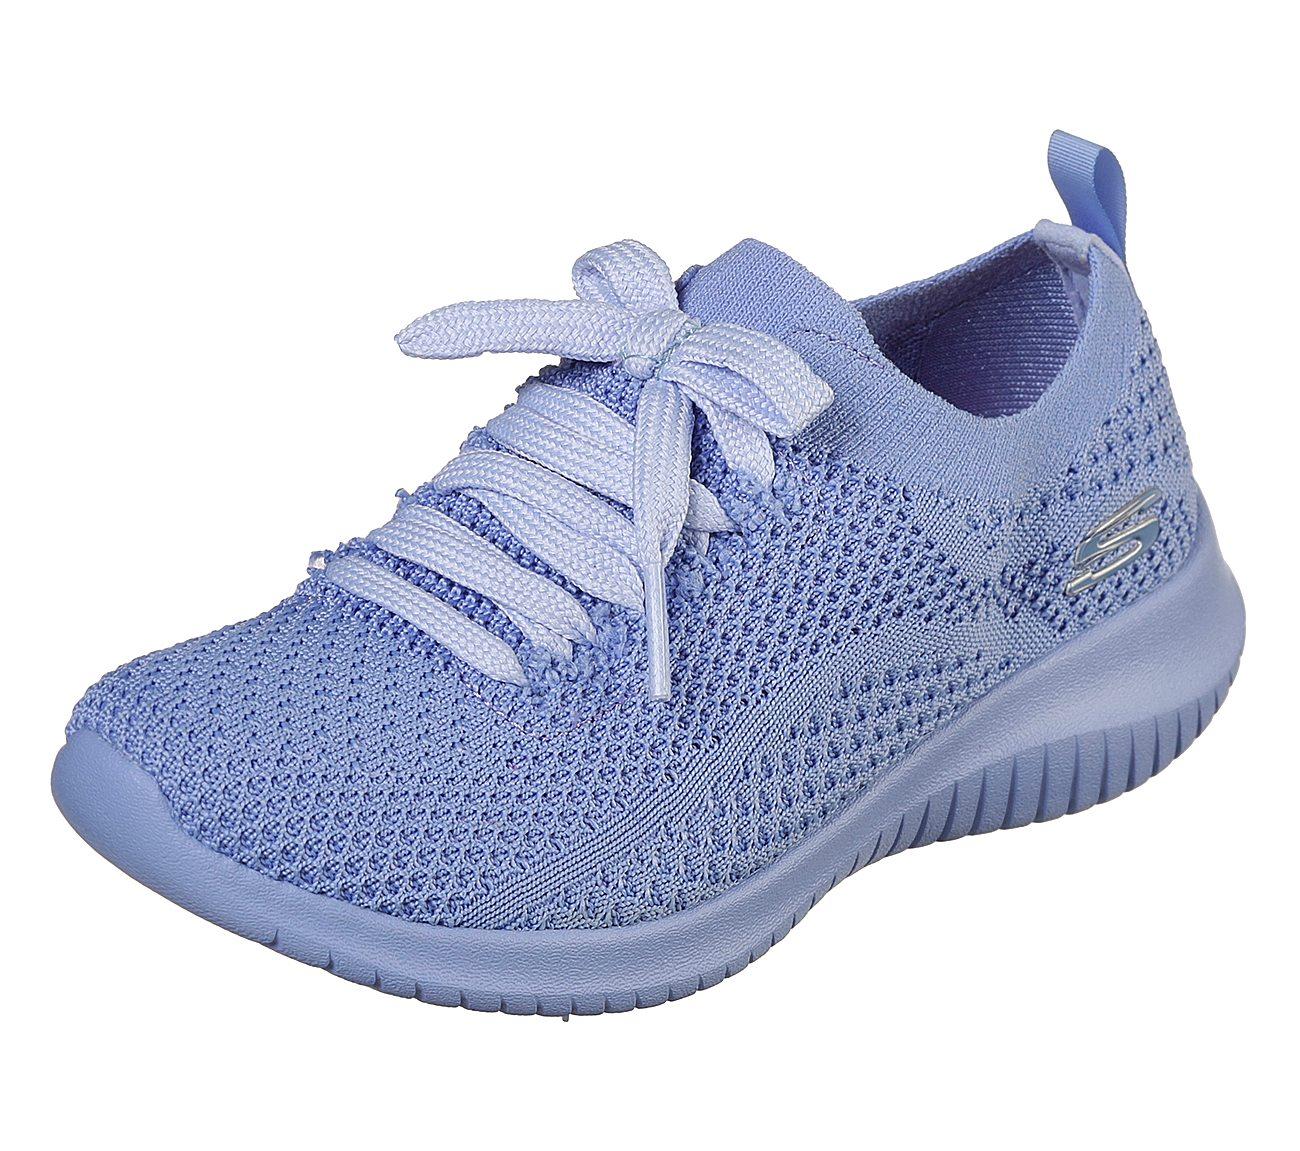 a6e4b9e7e741 Buy SKECHERS Ultra Flex - Statements Sport Shoes only  47.00